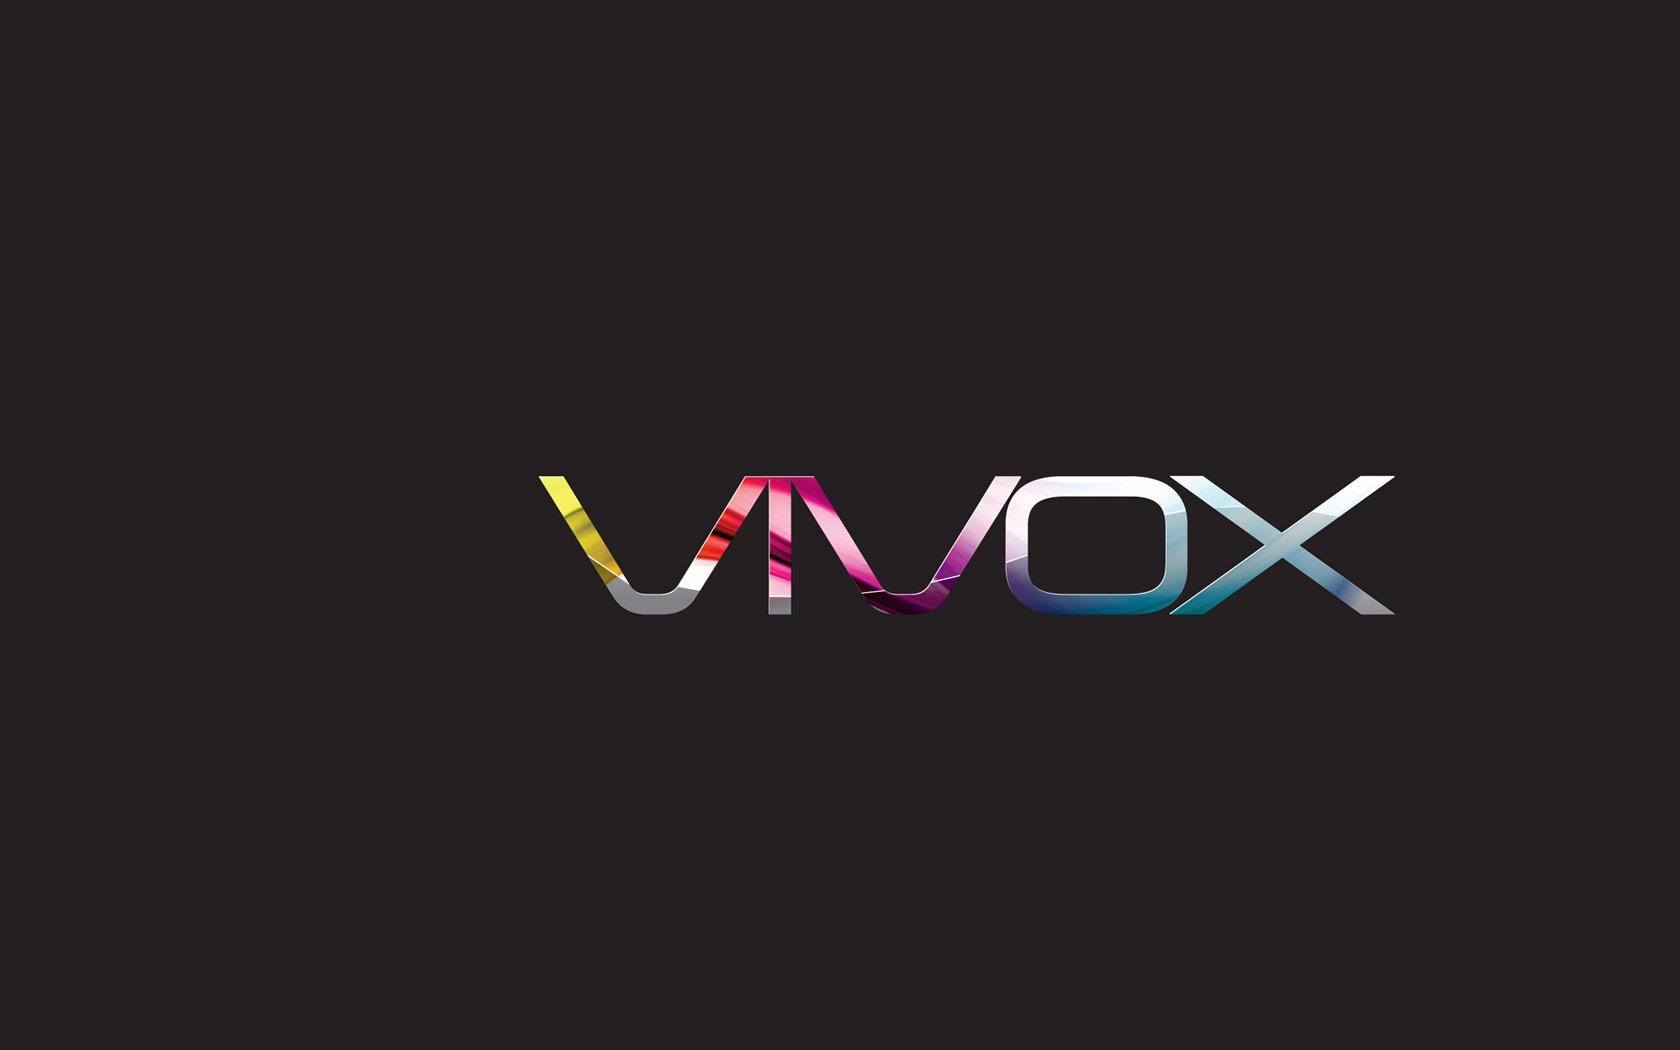 VIVOX X MAMUS